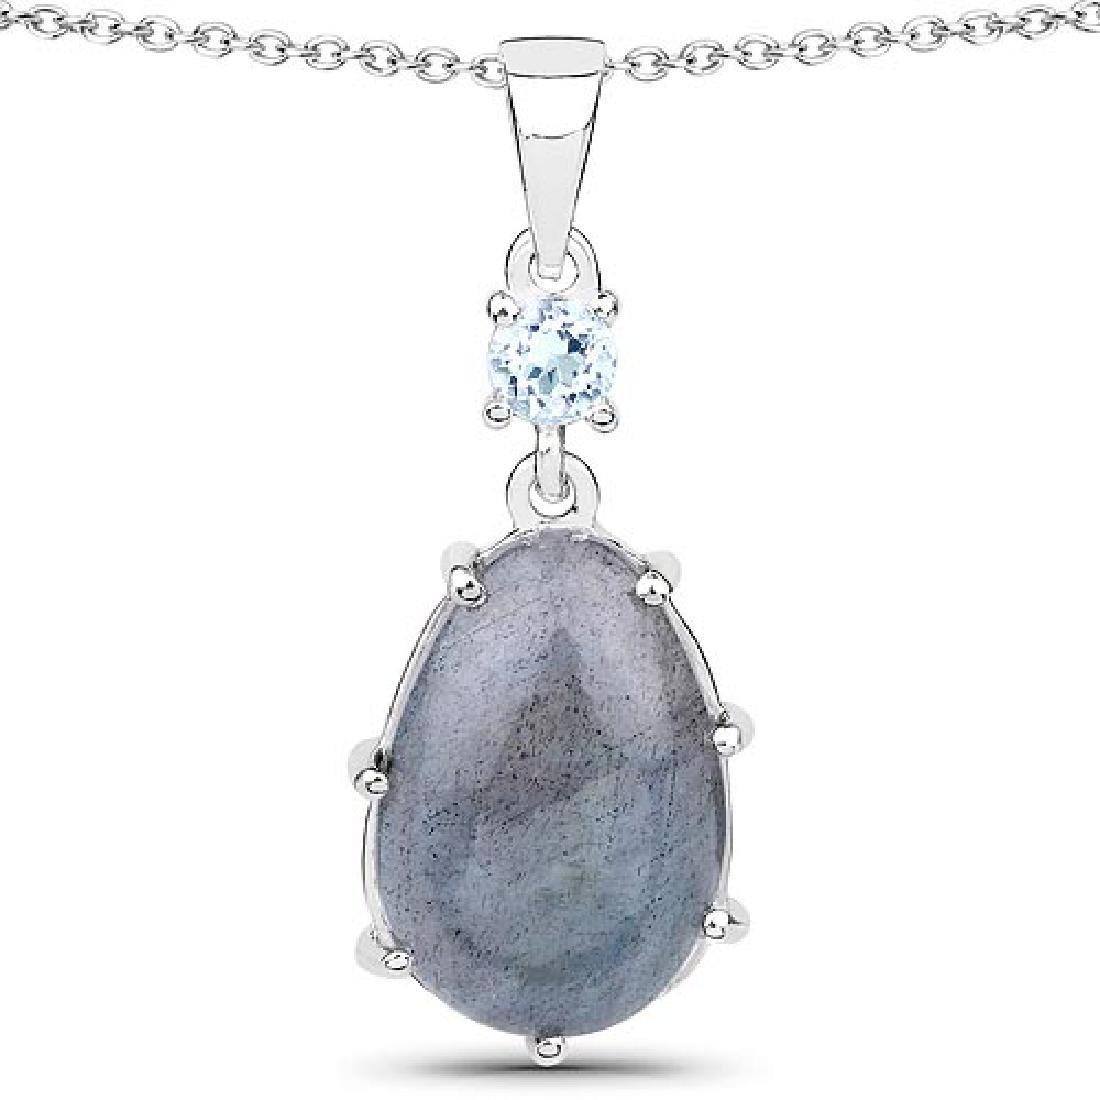 4.35 Carat Genuine Labradorite and Blue Topaz .925 Ster